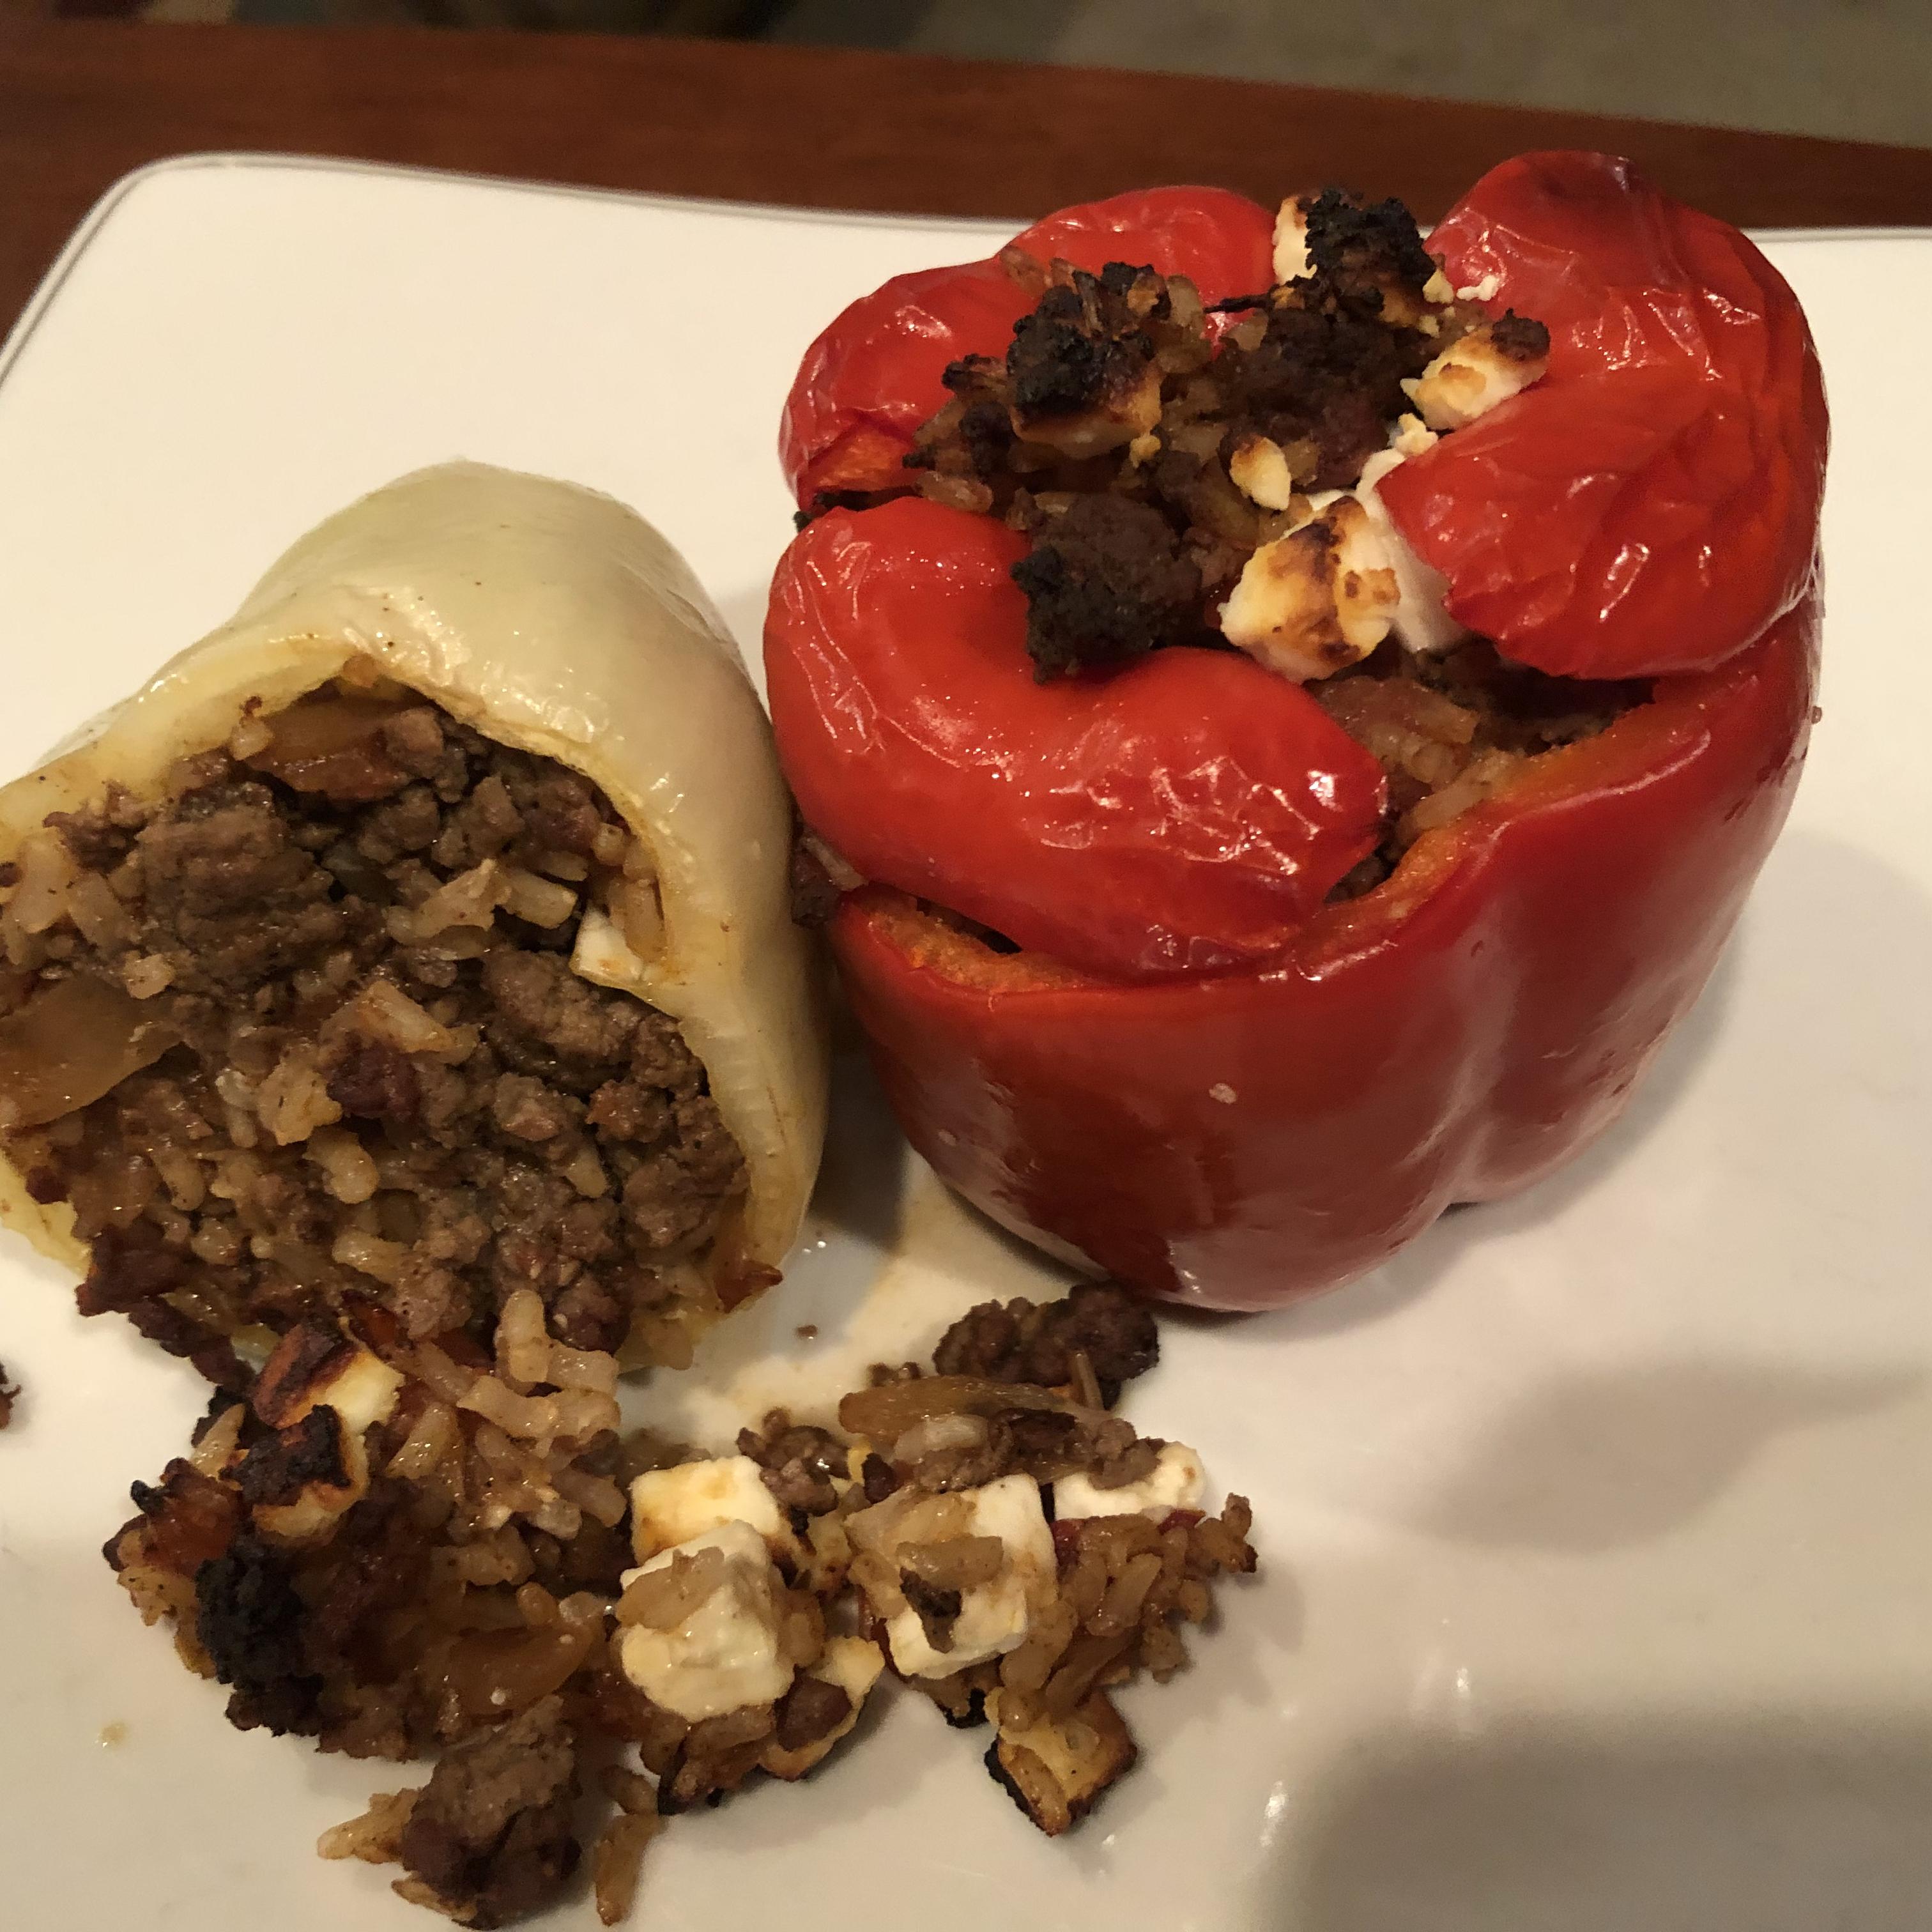 Greek Stuffed Tomatoes and Peppers (Yemista) Tallrific